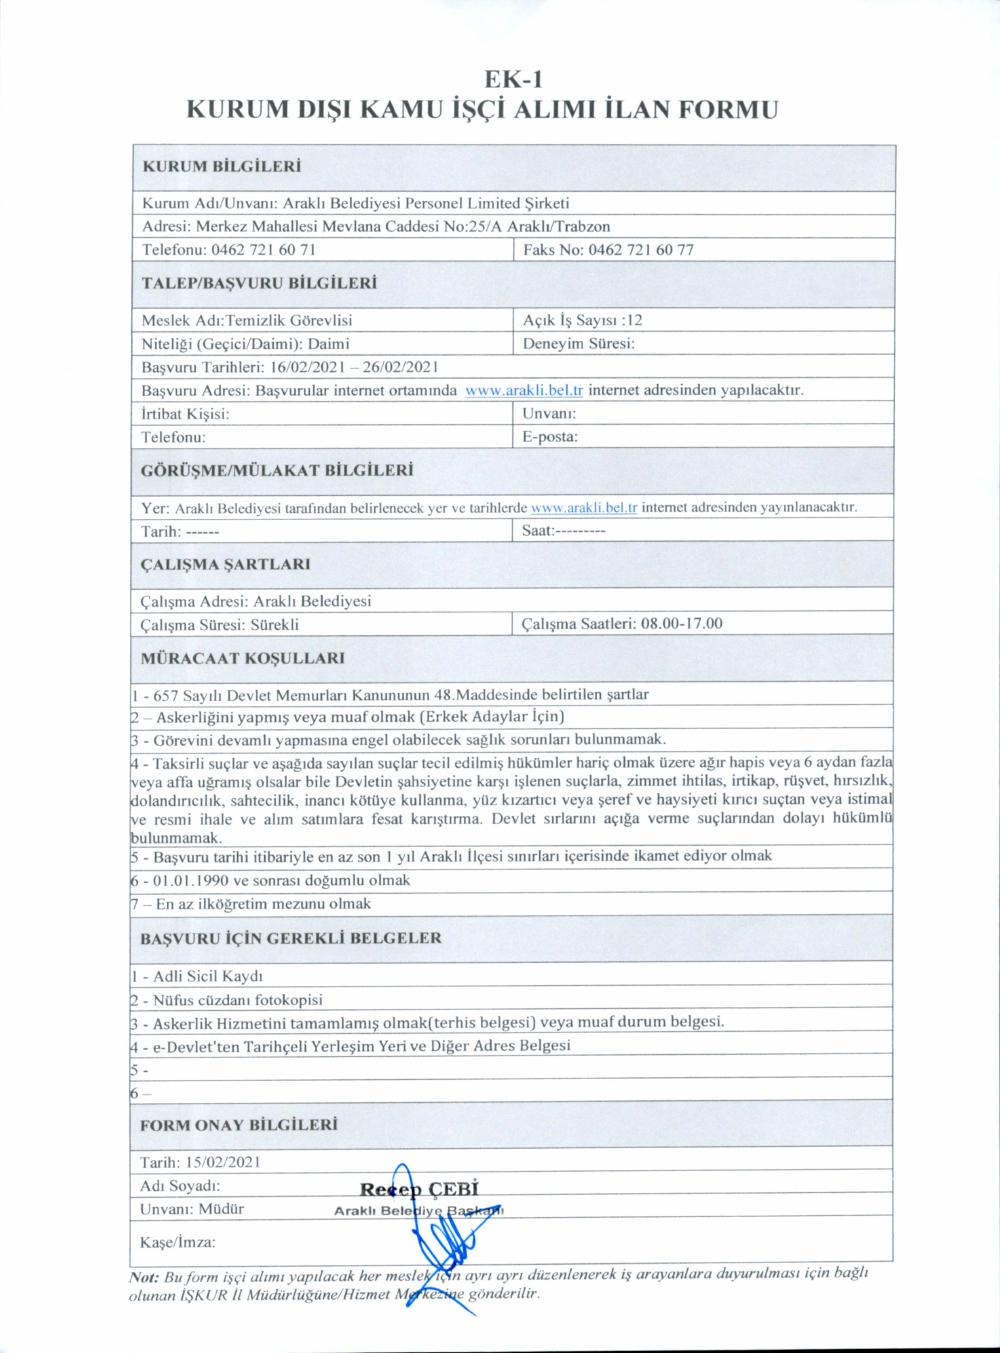 trabzon-arakli-belediyesi-per-ltd-sti-26-02-2021-000006.png